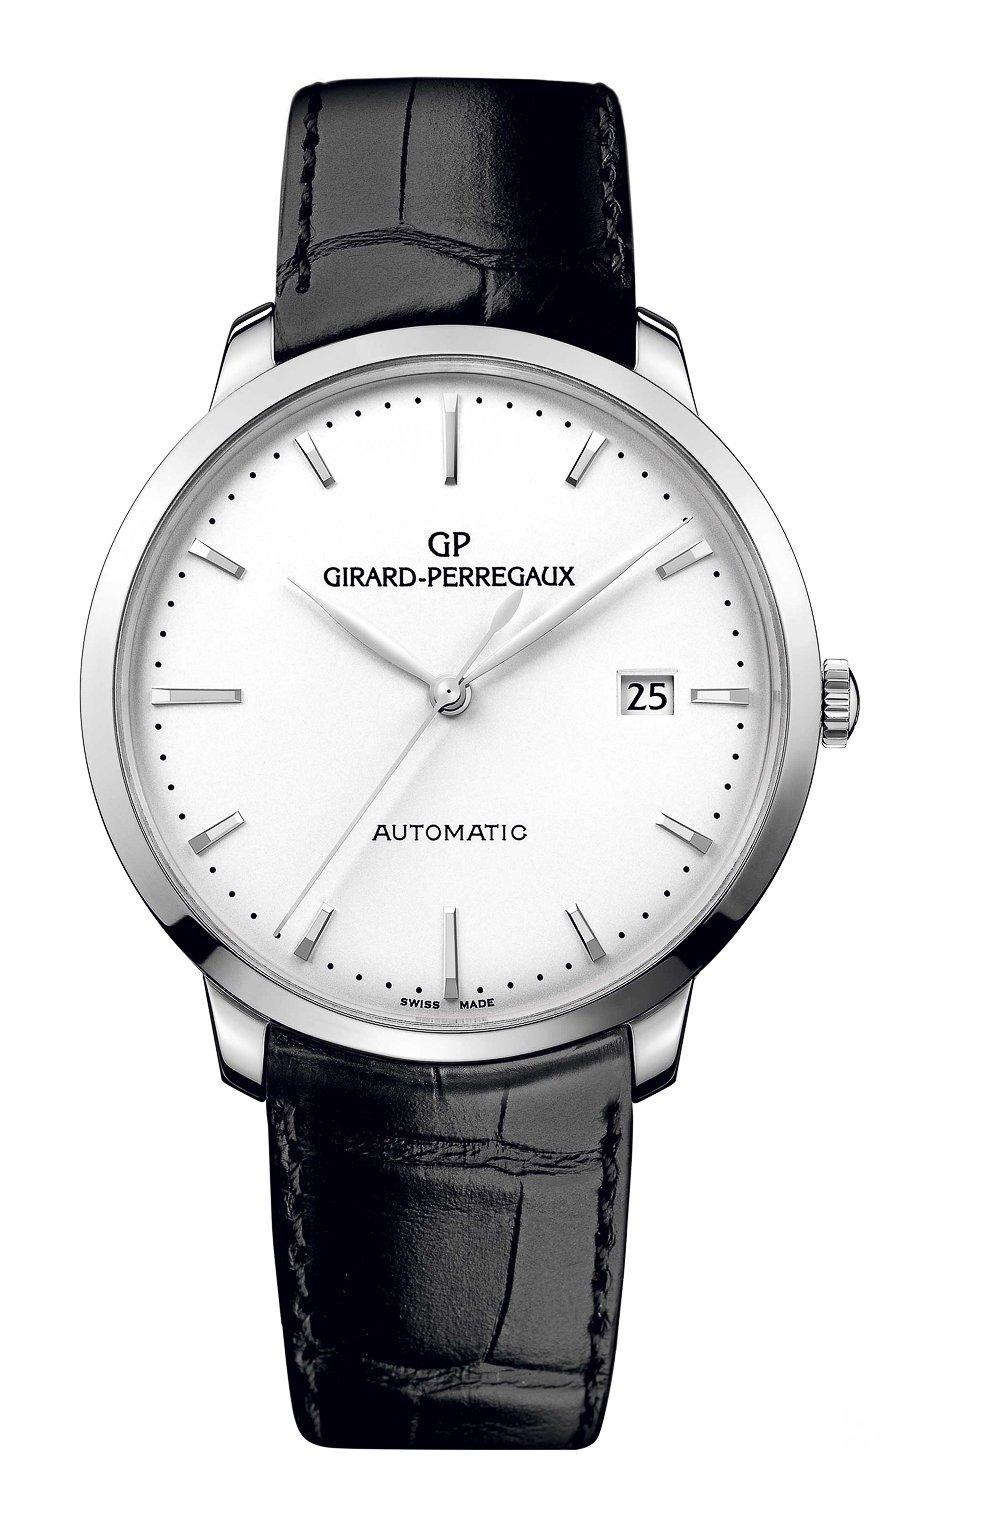 Мужские часы steel date white GIRARD-PERREGAUX белого цвета, арт. 49555-11-131-BB60 | Фото 1